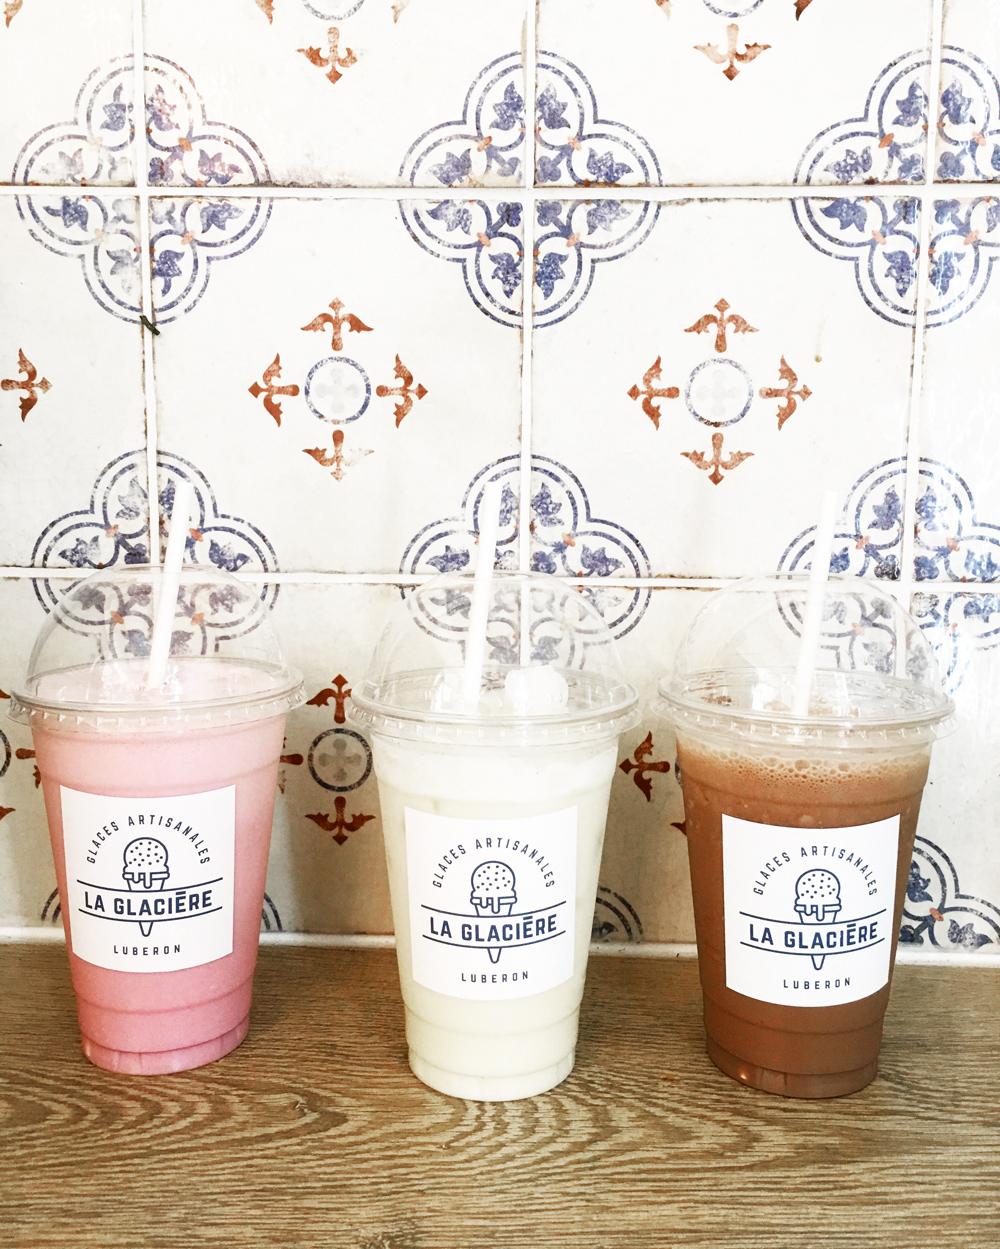 laglaciere-cucuron-milkshake-glaces